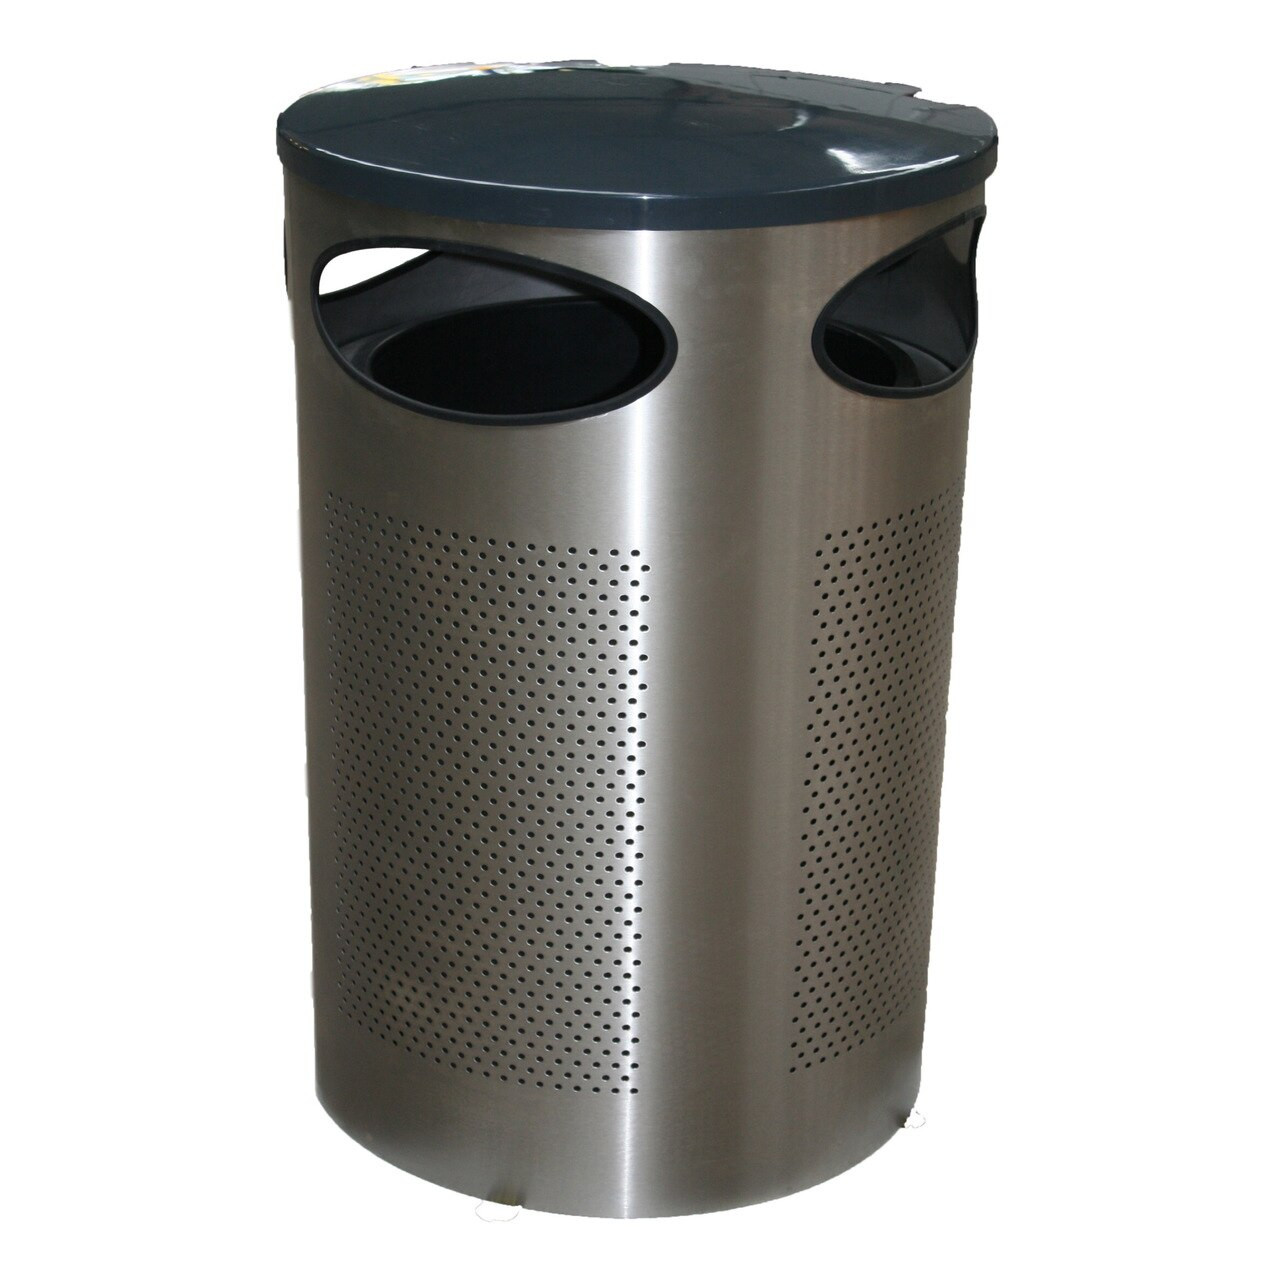 Halo 80 Plus stainless steel metal blast resistant litter bin